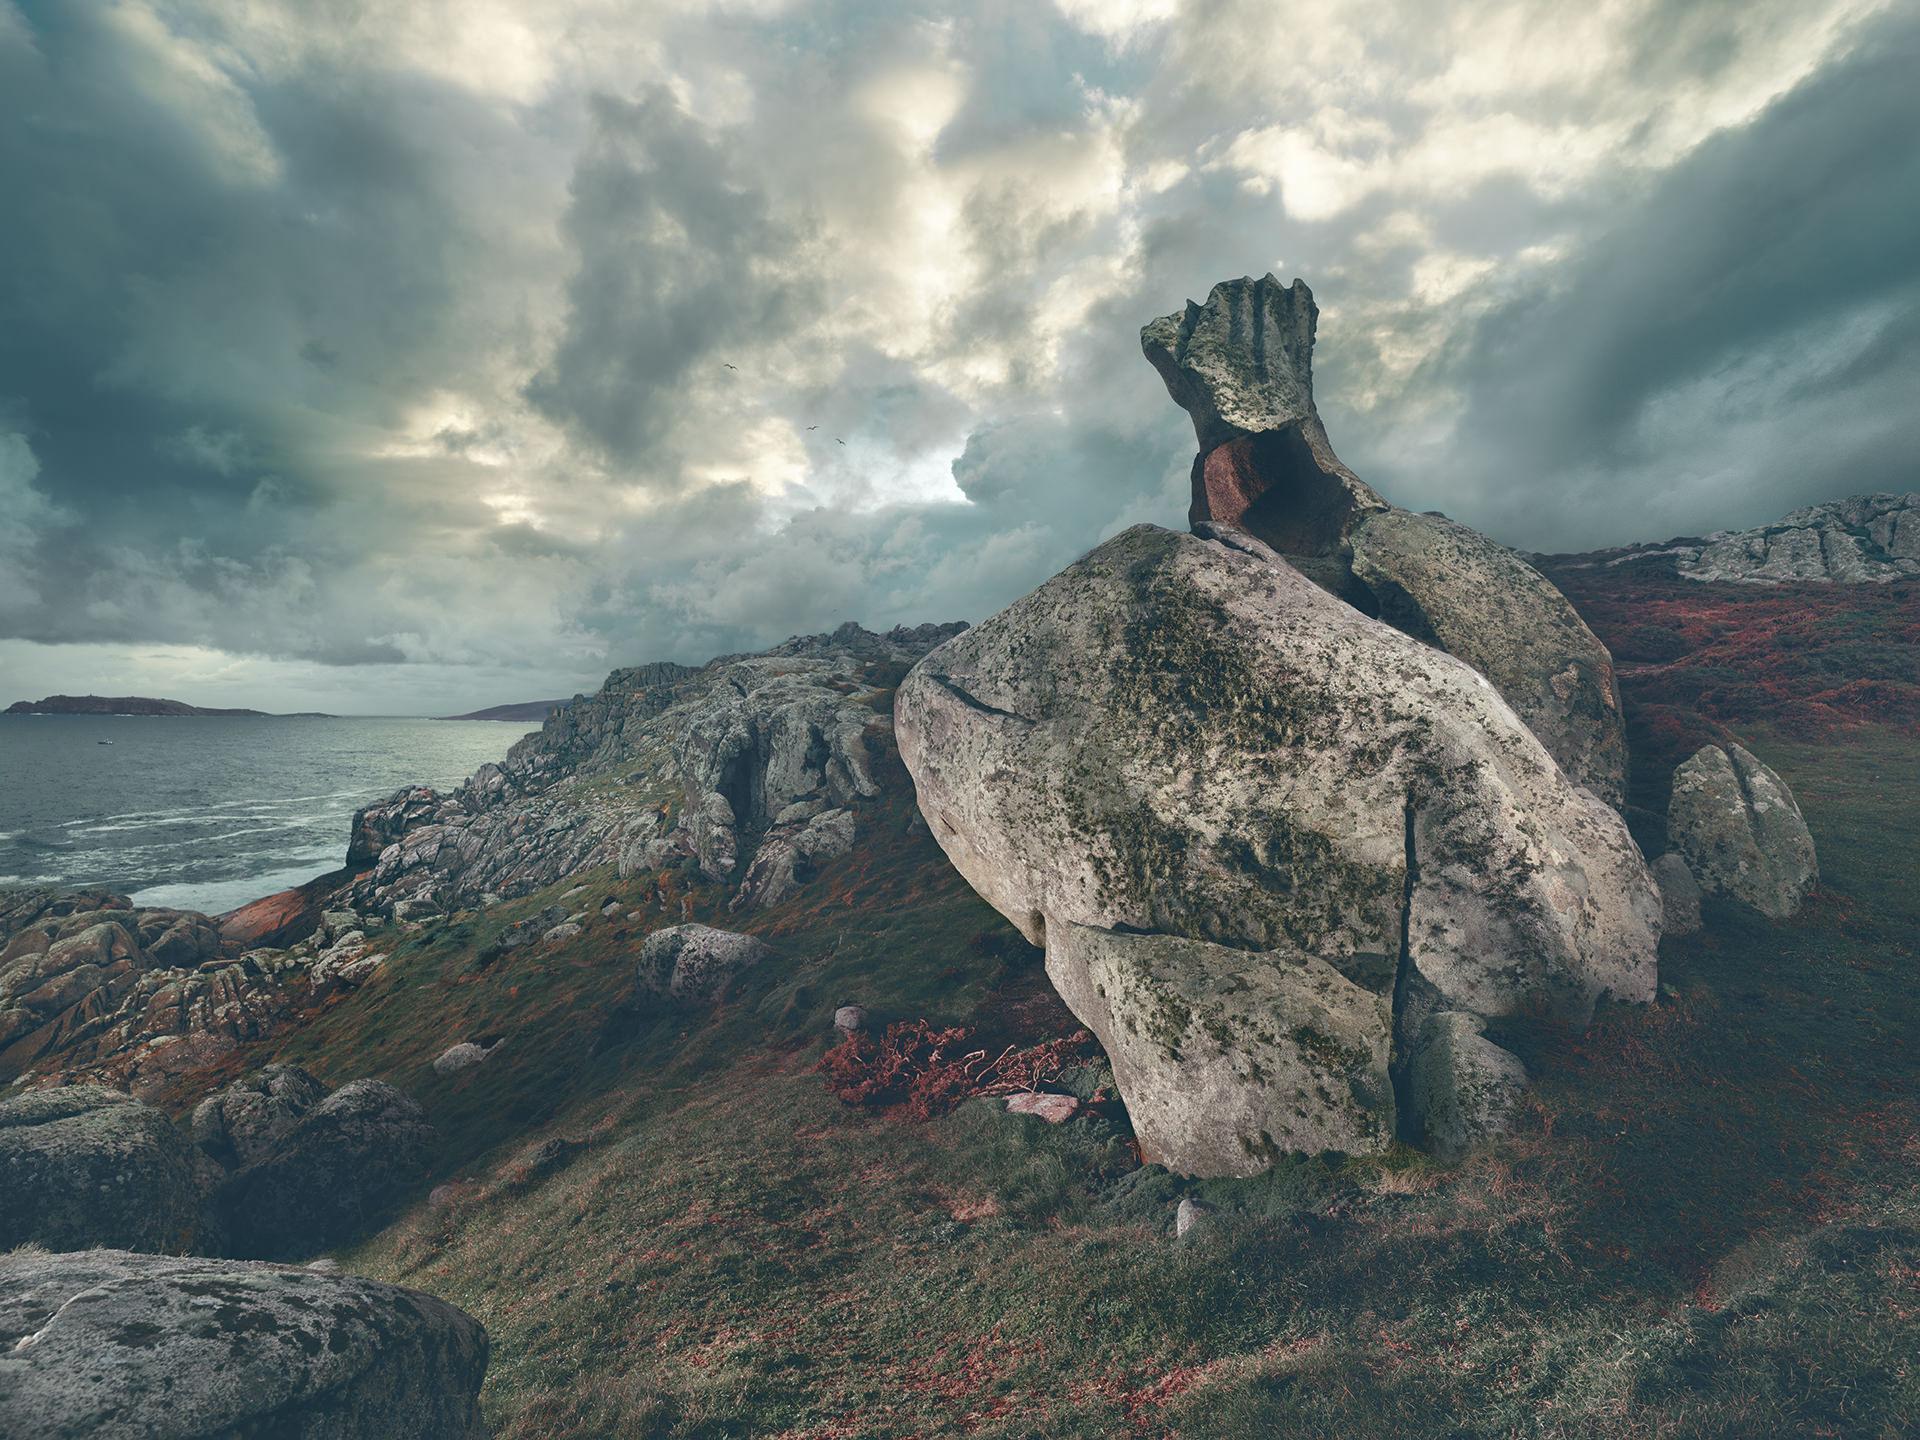 ©ankeluckmann1723, coast, galicia, green, landscape, rocks, spain, anke luckmann, www.ankeluckmann.com